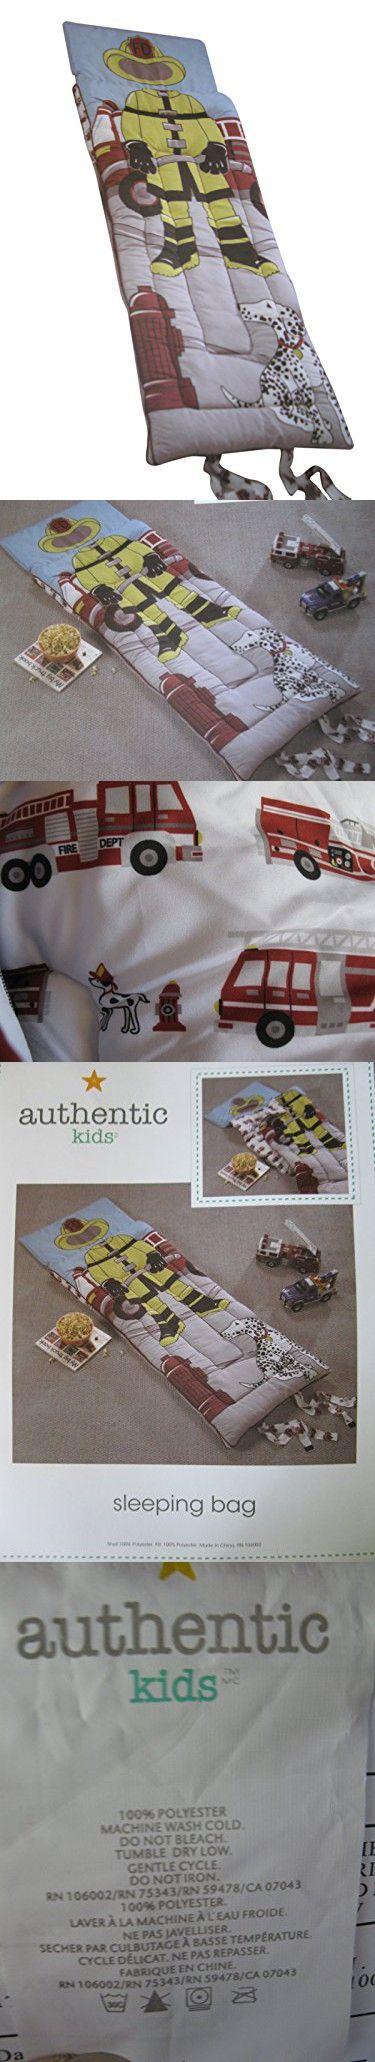 huge discount f6a05 9b11e Authentic Kids Fireman Sleeping Bag | Sleeping Bags | Bags ...